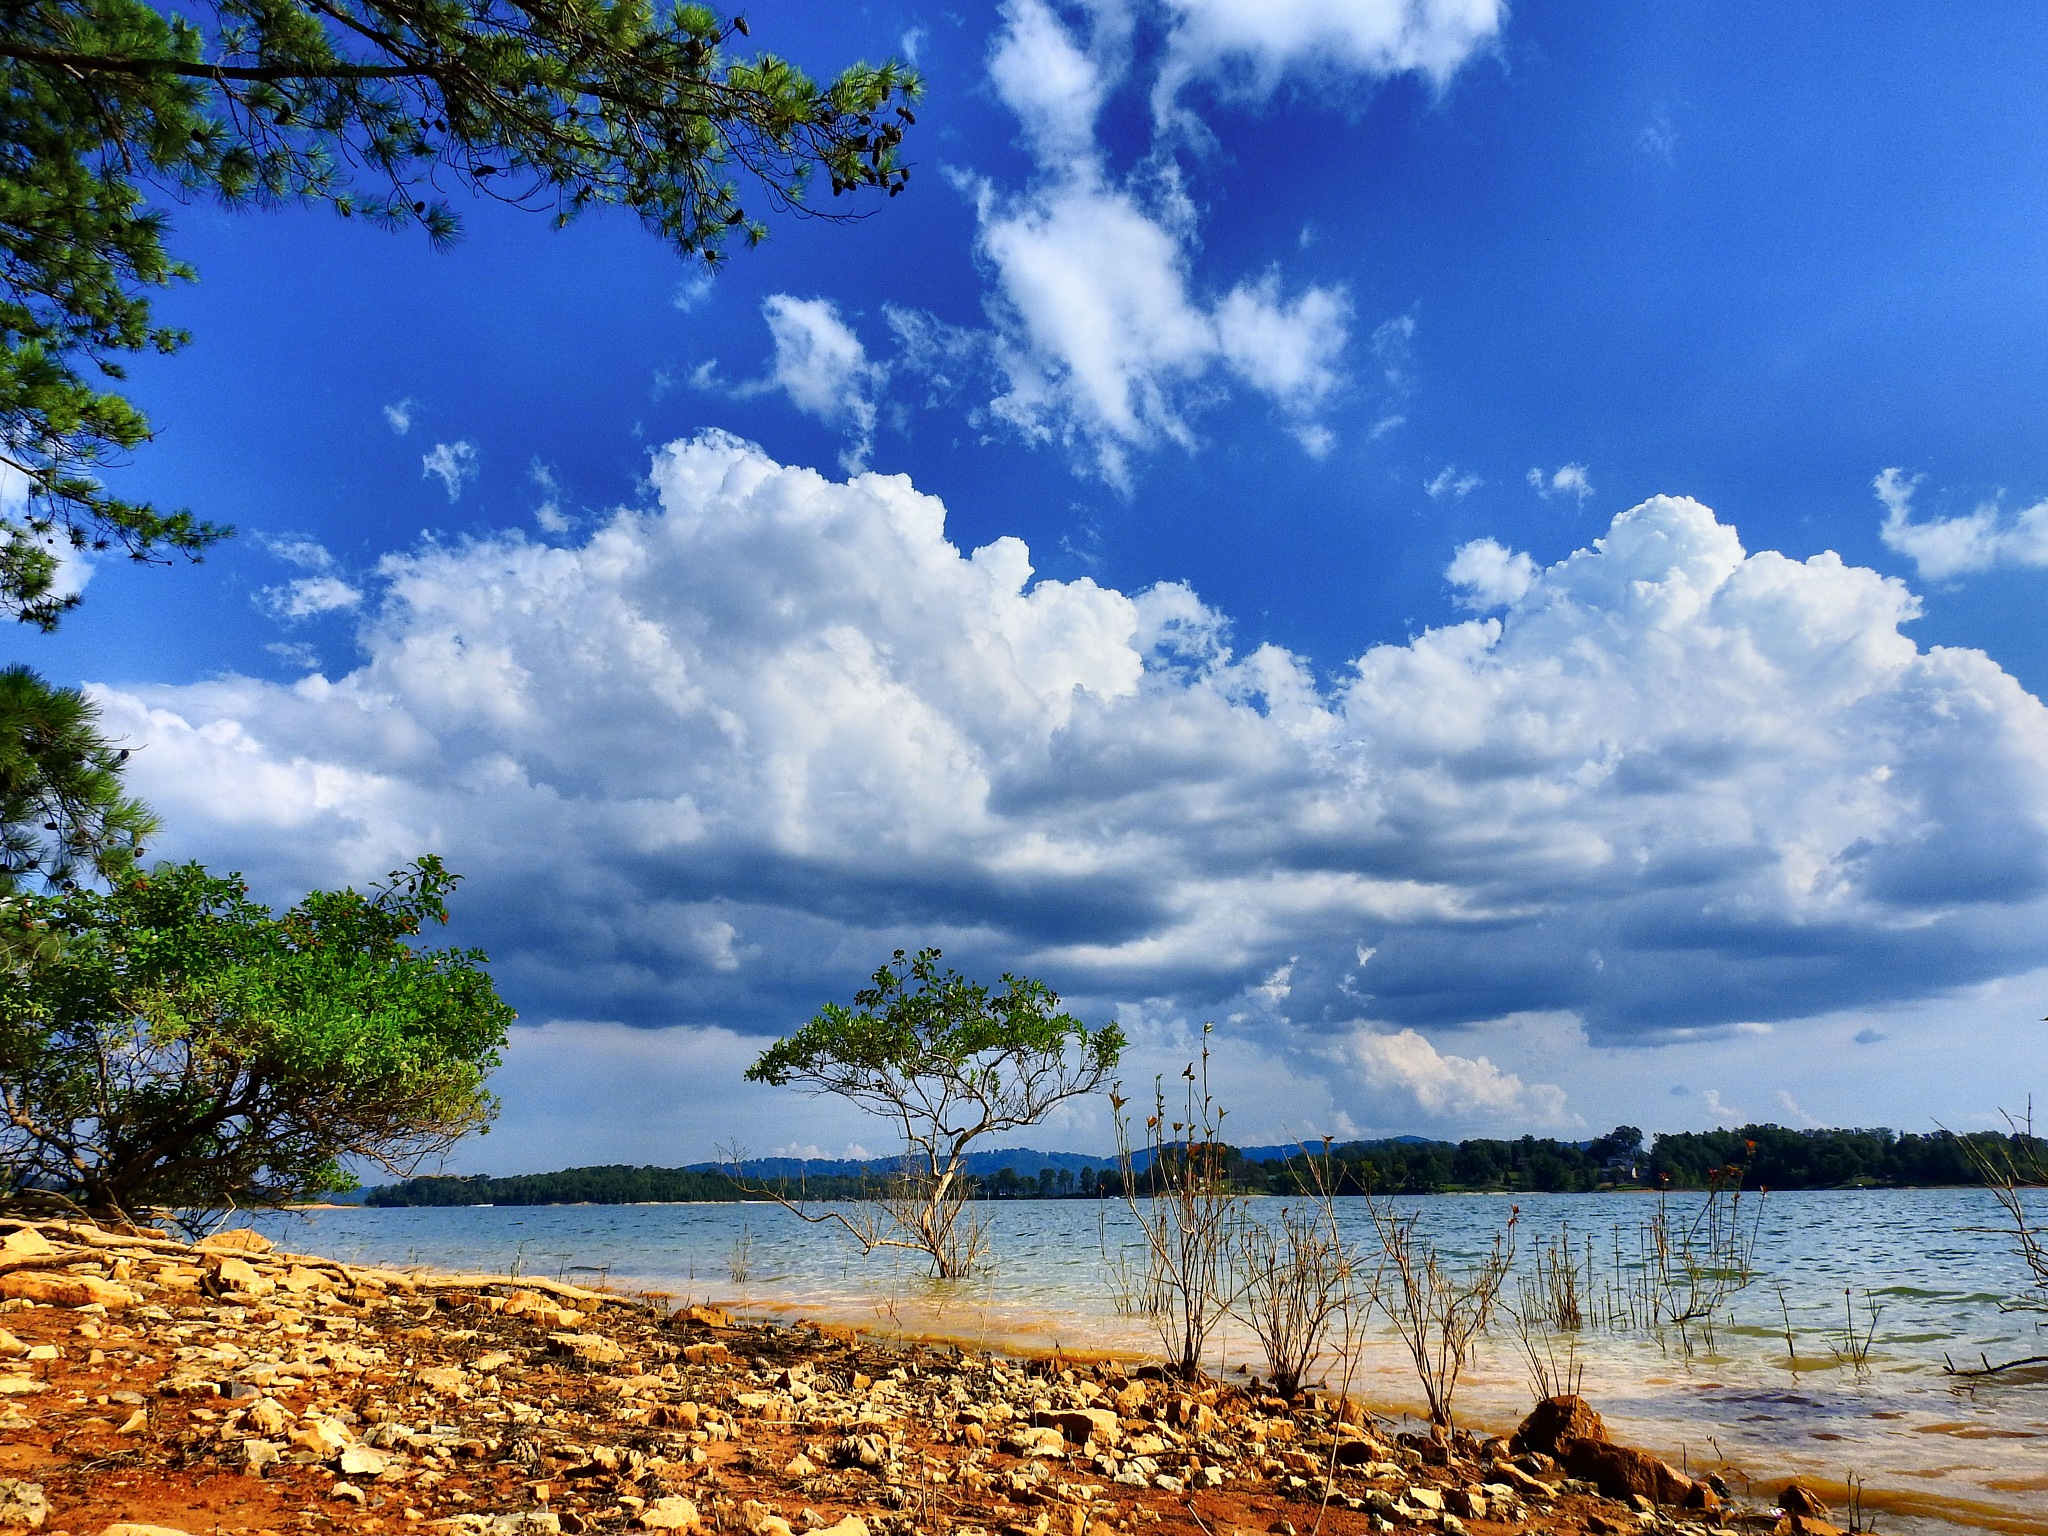 The Lake Shore Returns by Patty Stockton